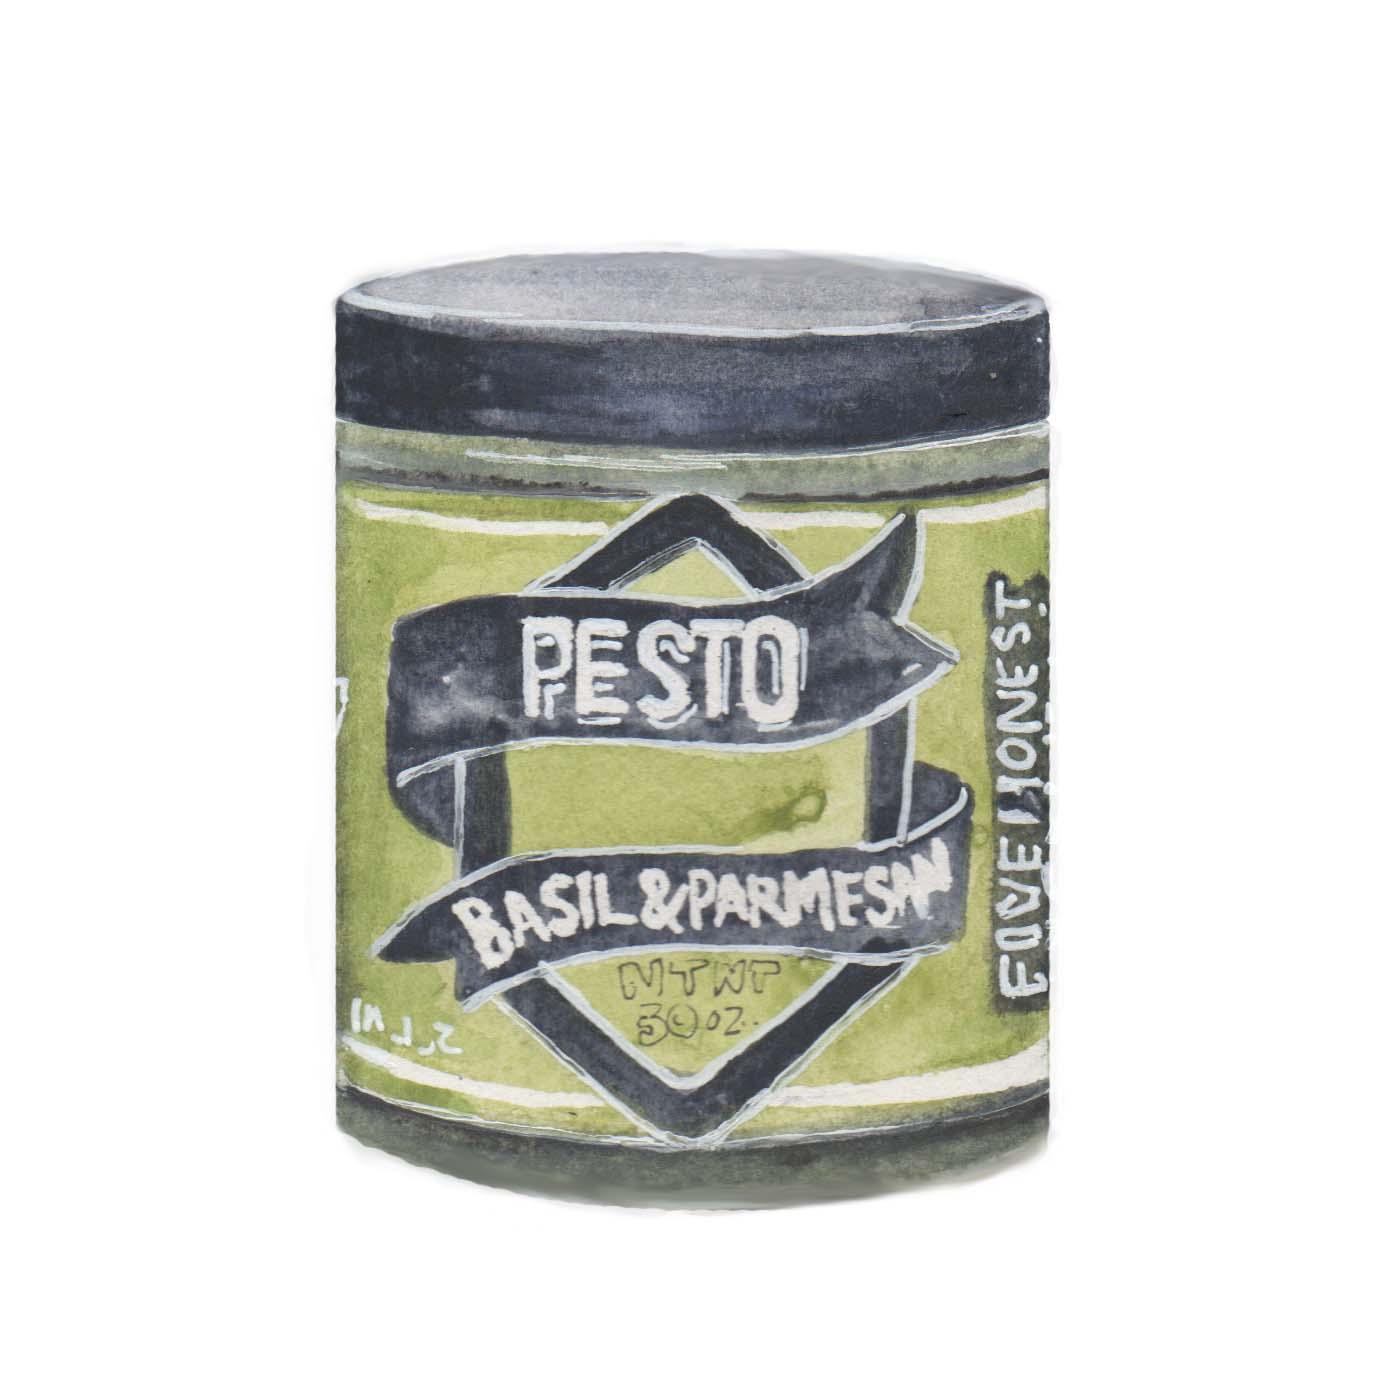 Condimental_Pesto_Edit.jpg